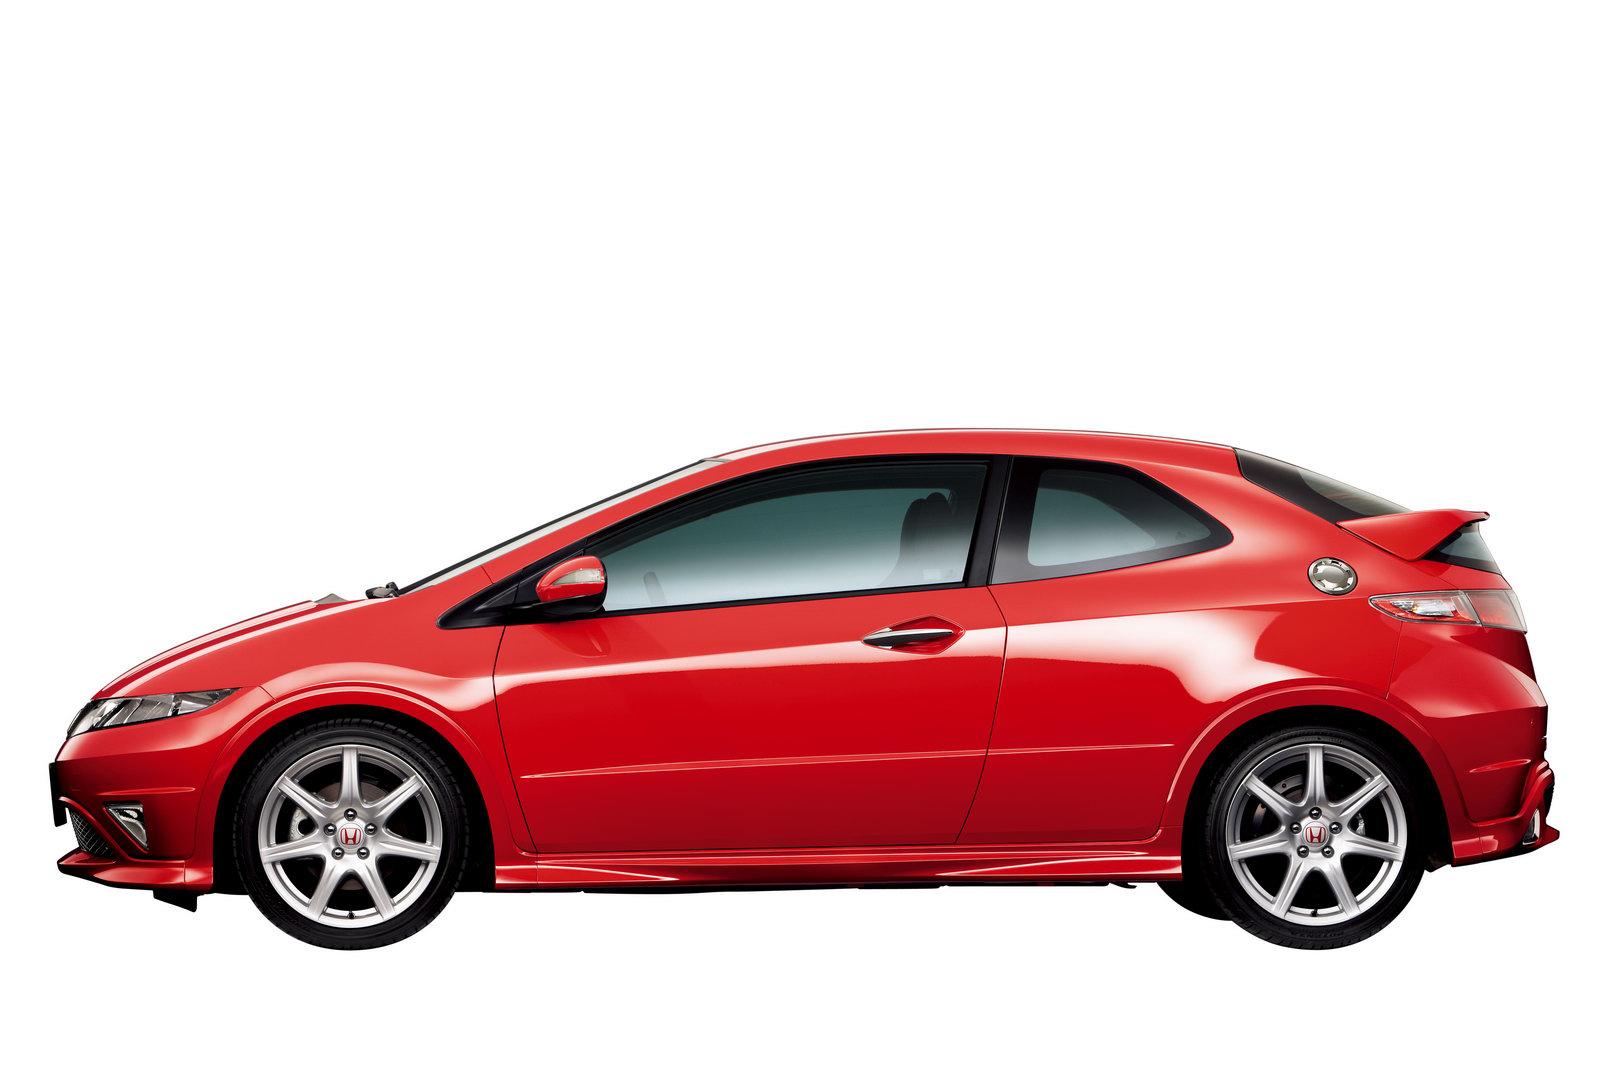 http://1.bp.blogspot.com/_2o5Lep2wWQs/TM4xCwQgUJI/AAAAAAAAB8E/H9HPAnPhPVQ/s1600/2011-Honda-Civic-Type-R-Euro-4.jpg